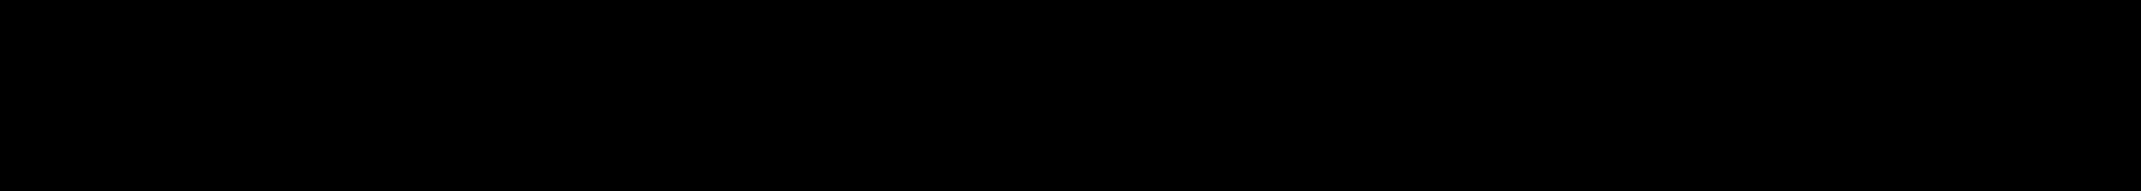 Museo Sans Cyrillic 500